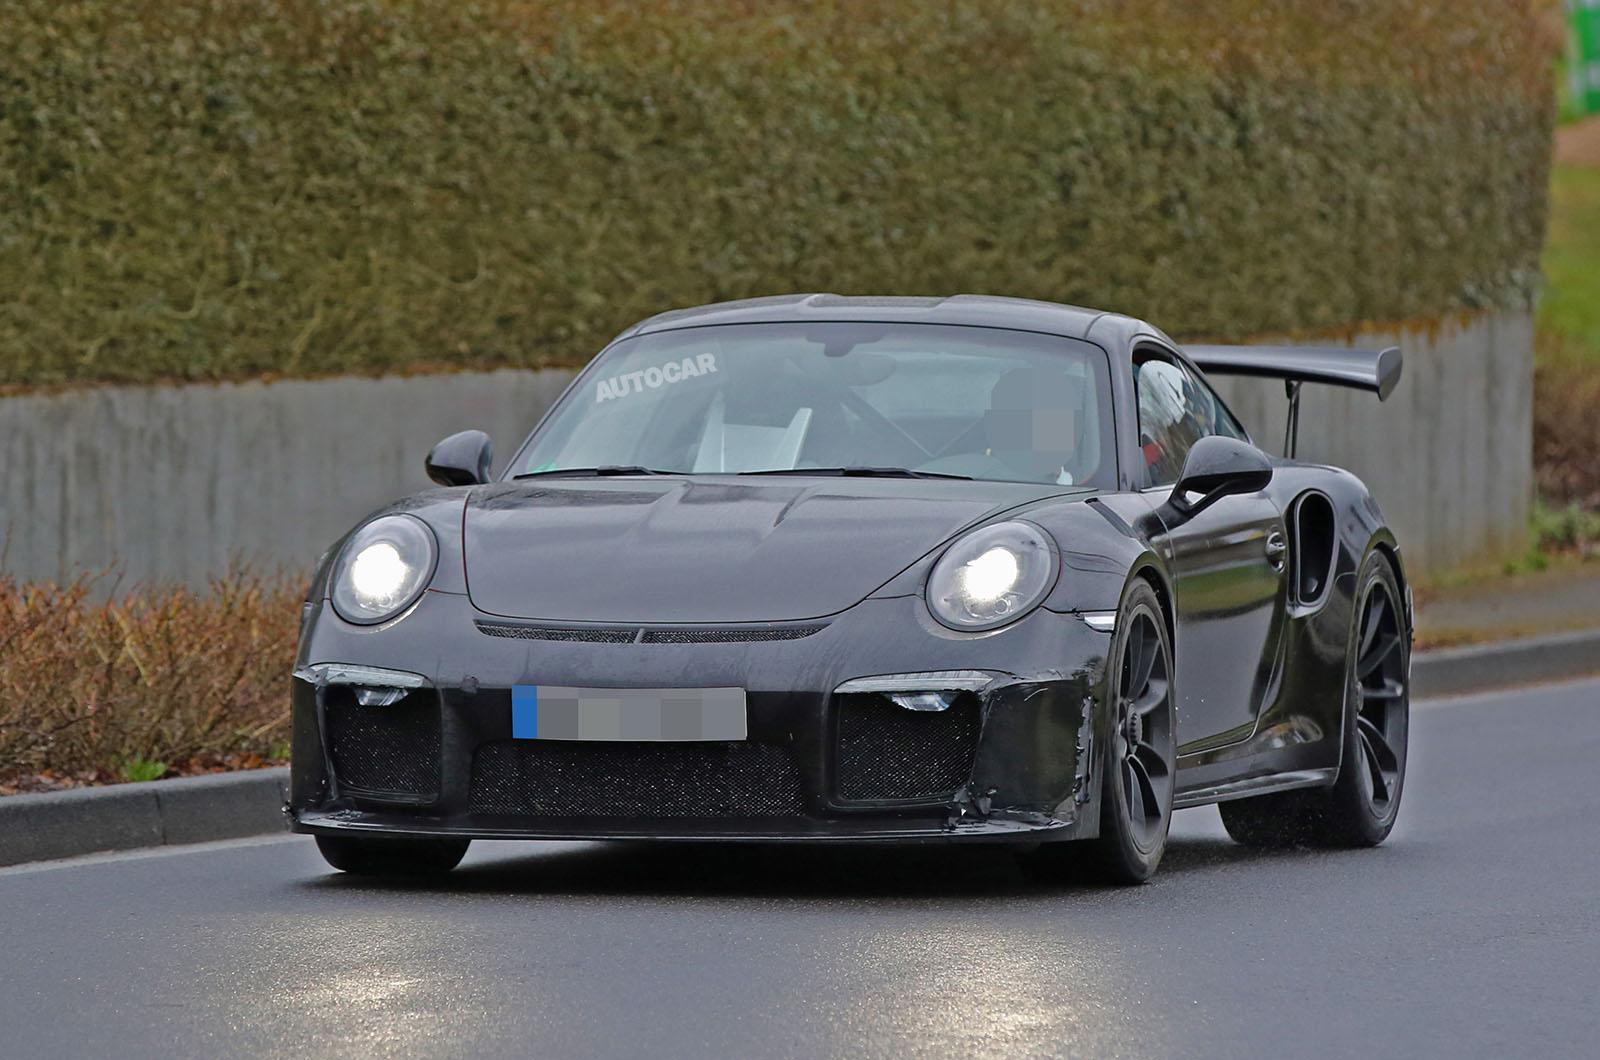 Porsche 911 gt3 rs review 2017 autocar - Porsche 911 Gt3 Rs 4 2 Could Get 518bhp From Enlarged Flat Six Autocar